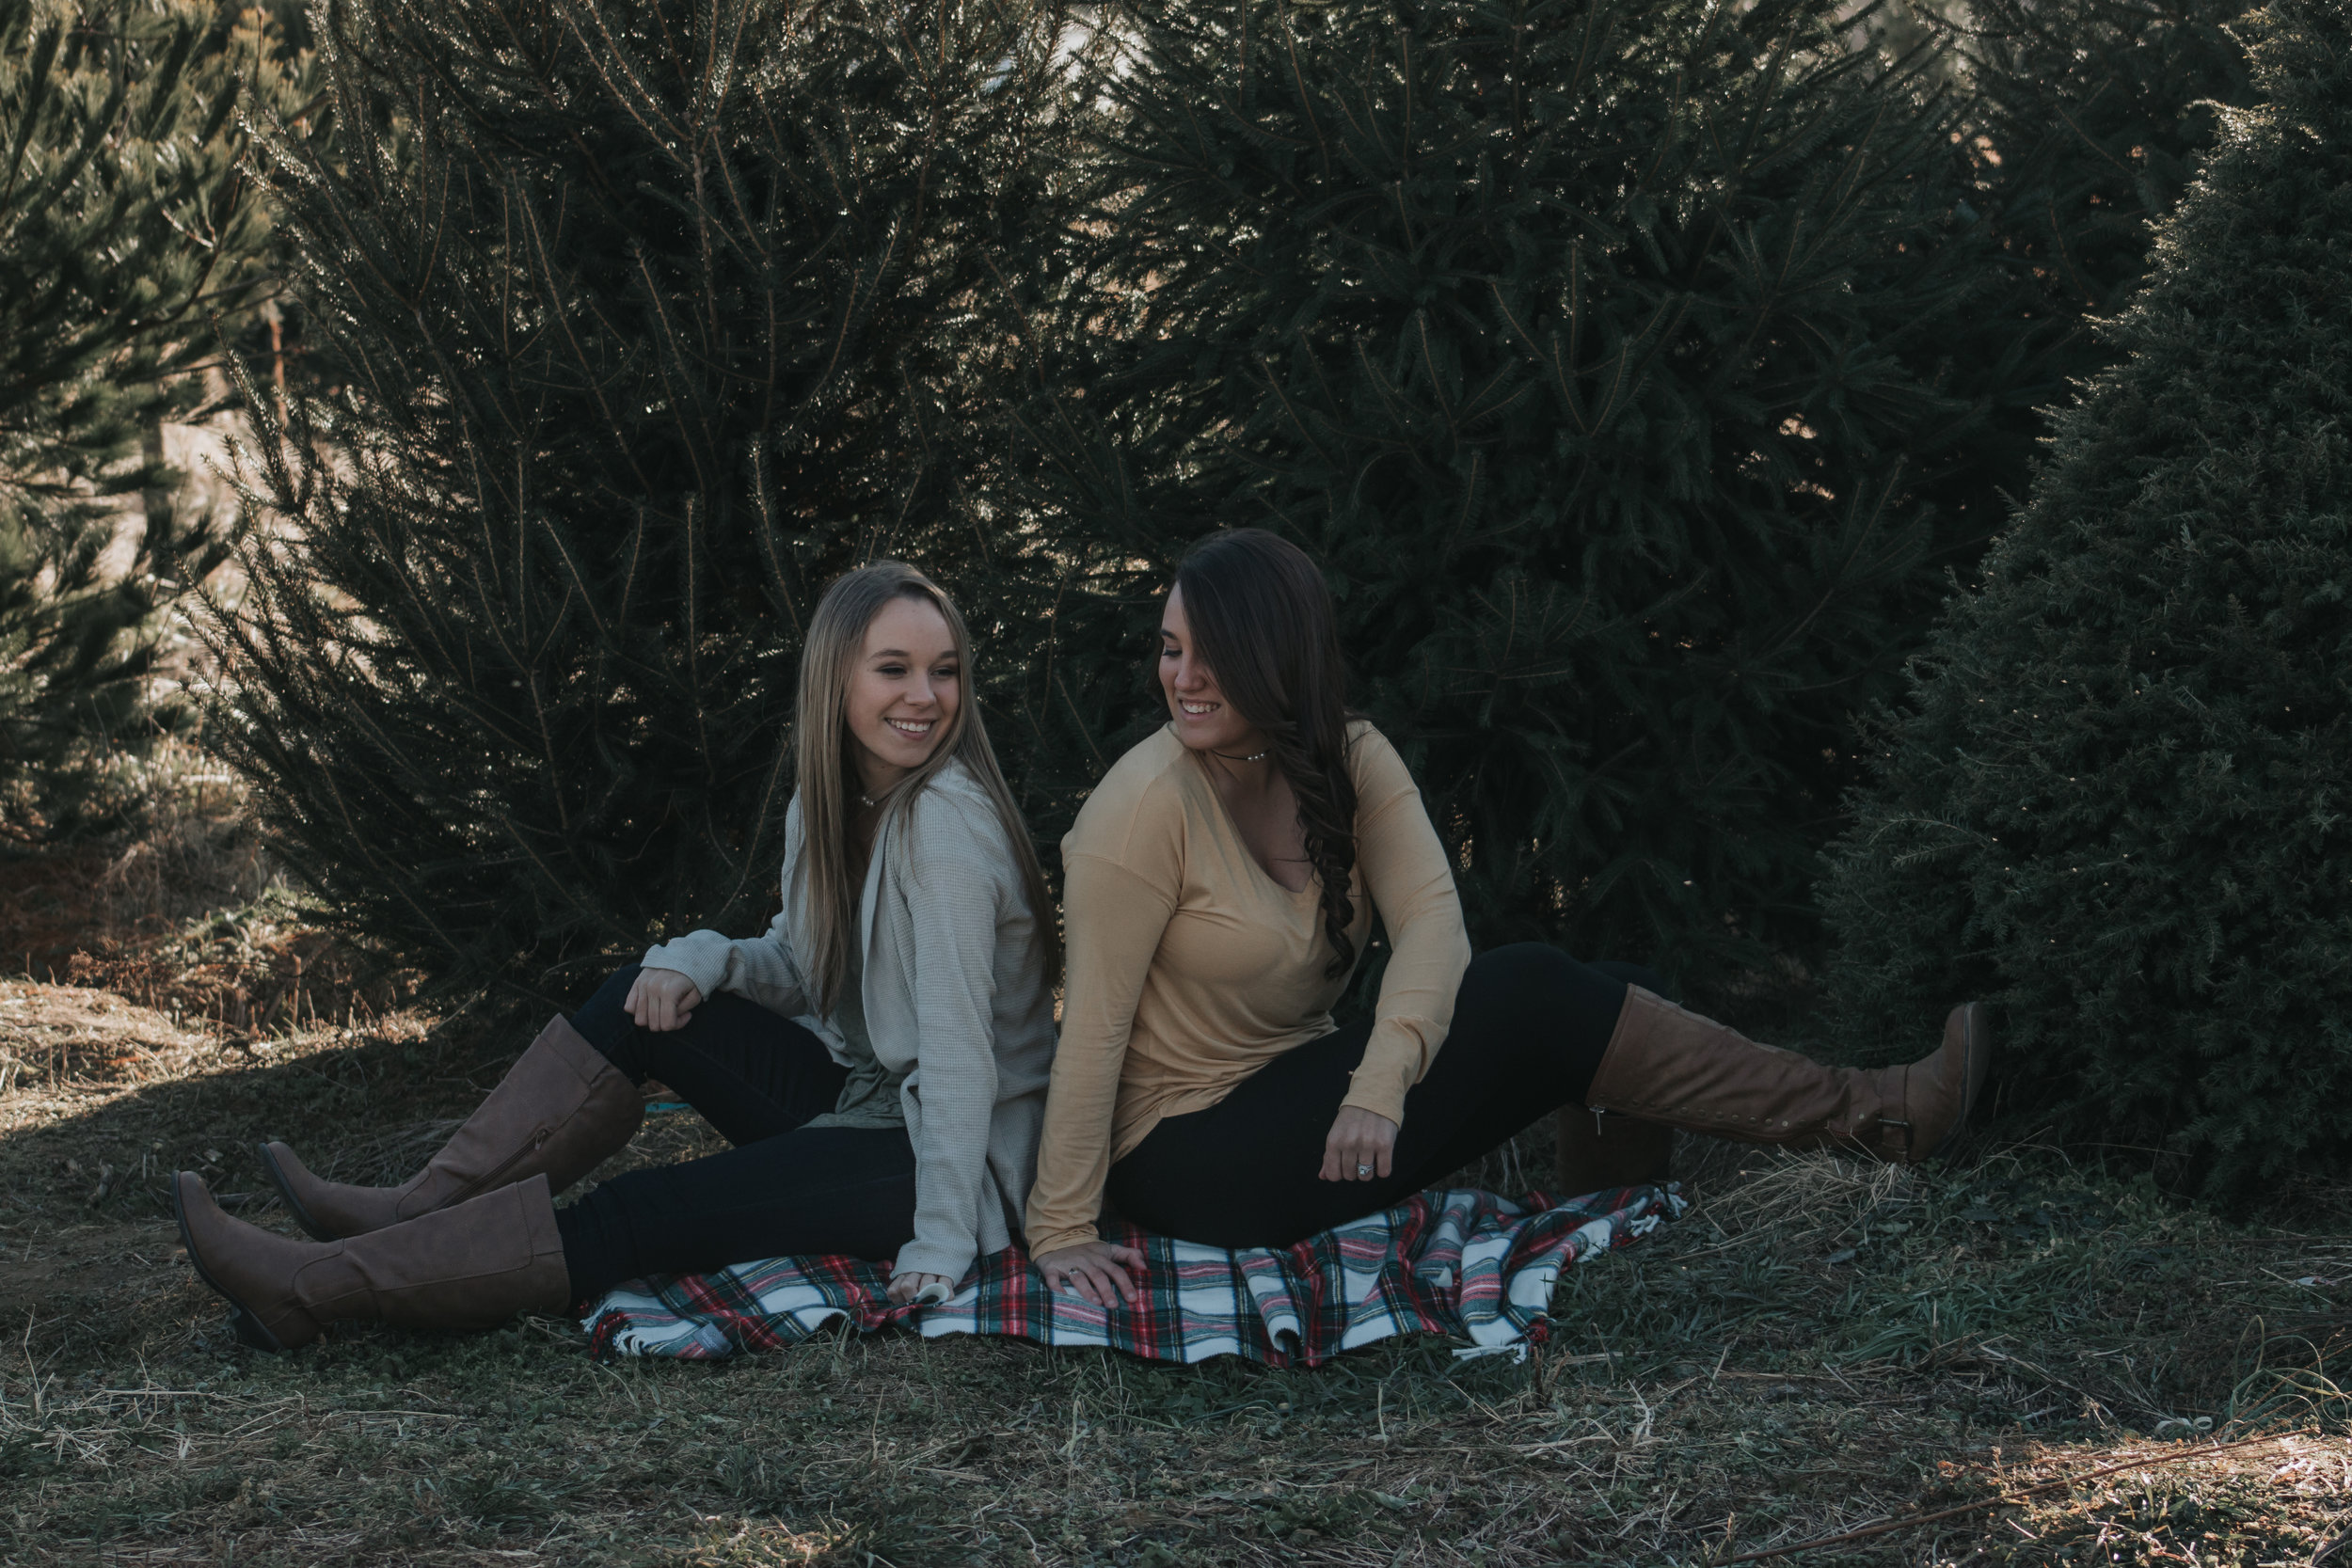 Jamie (left) Katie (right)